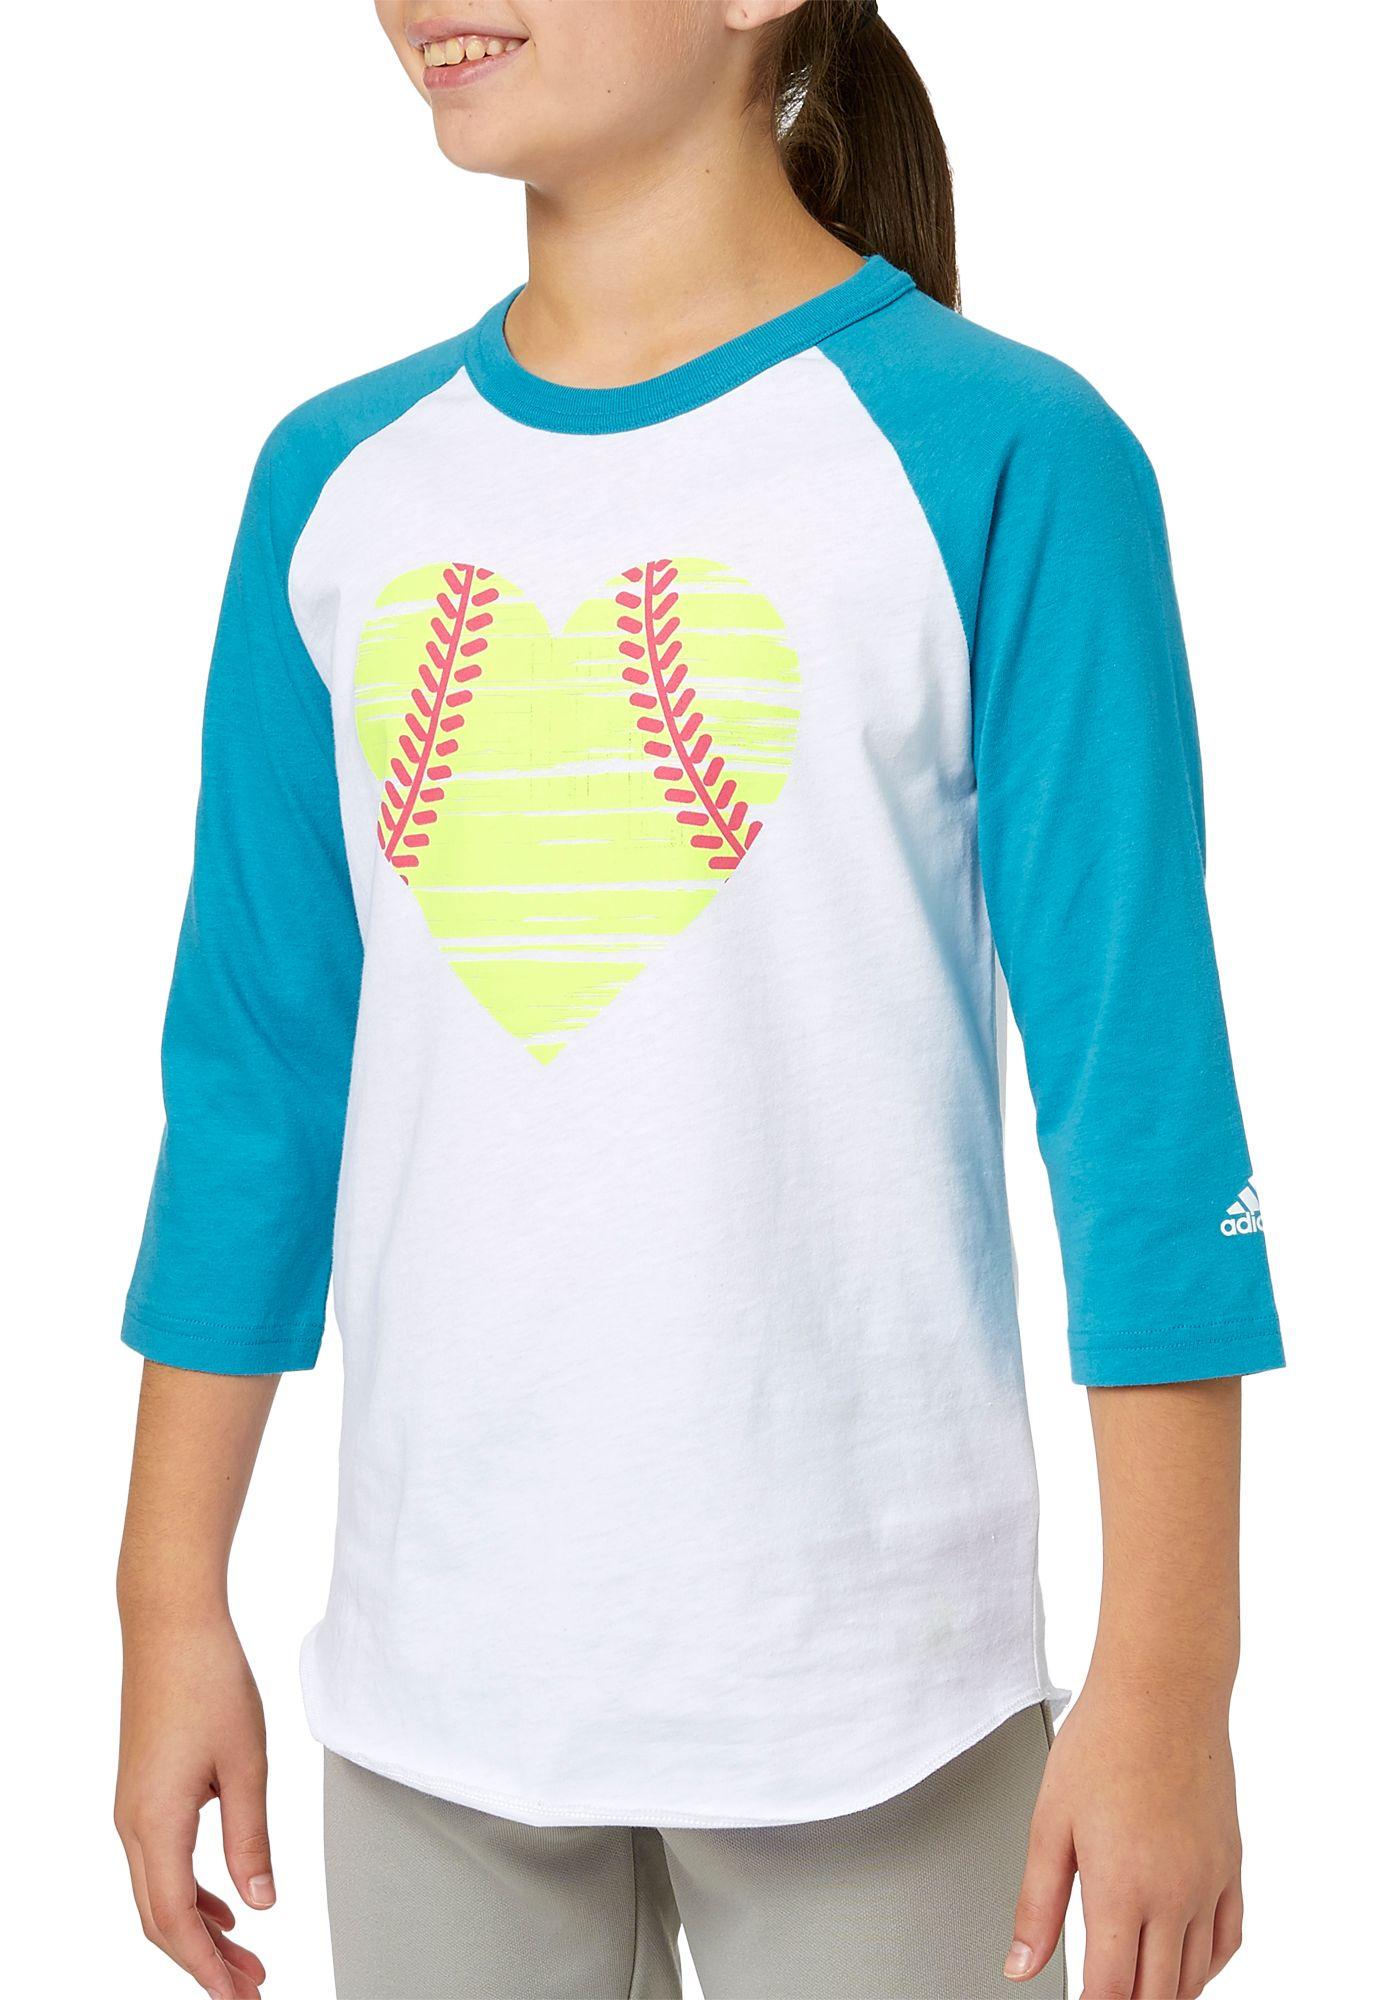 adidas Girls' Destiny Heart ¾ Sleeve Softball Shirt